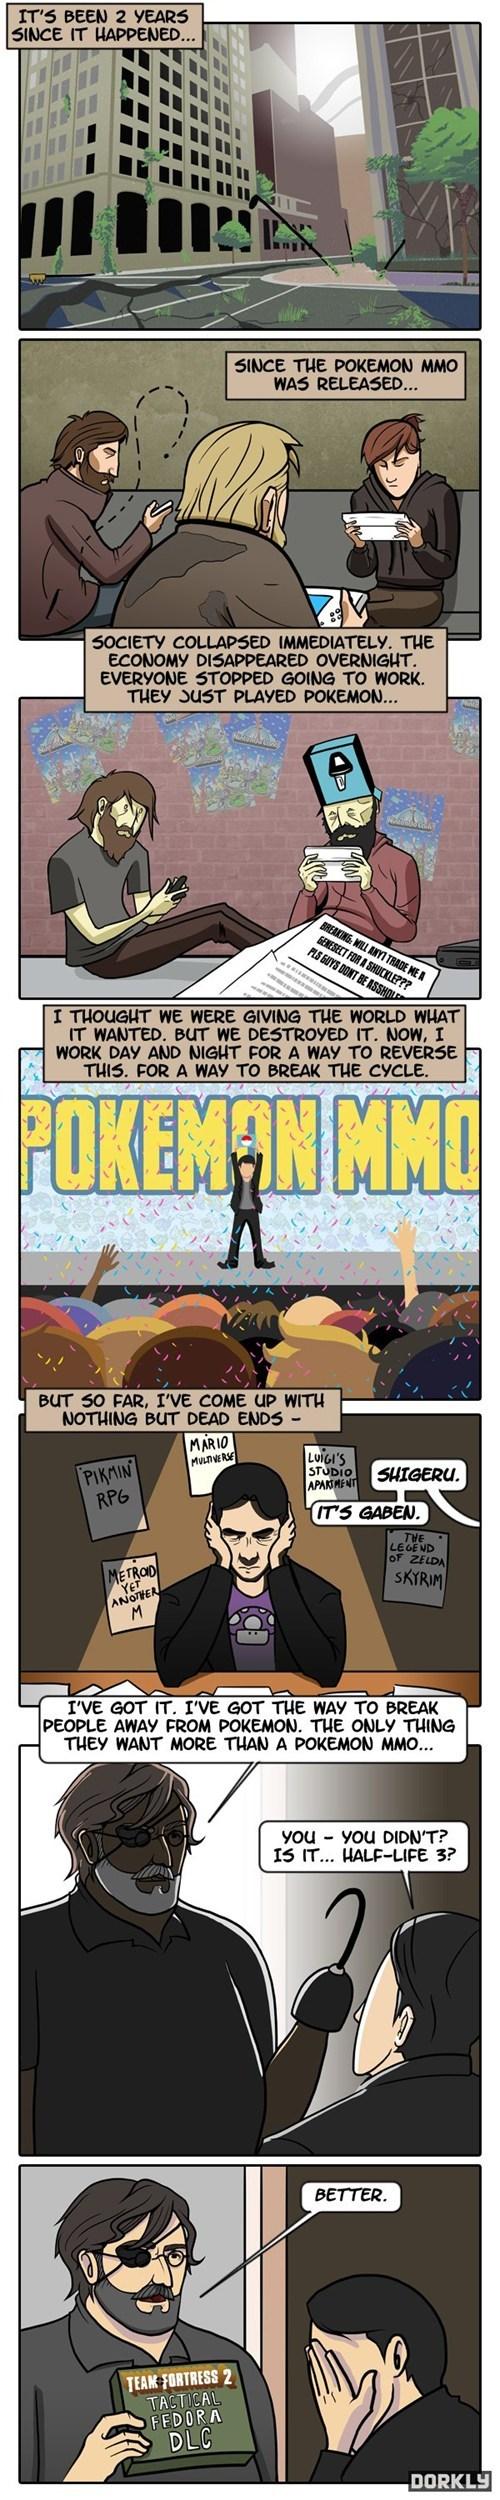 valve Pokémon dorkly comics nintendo - 7599492864